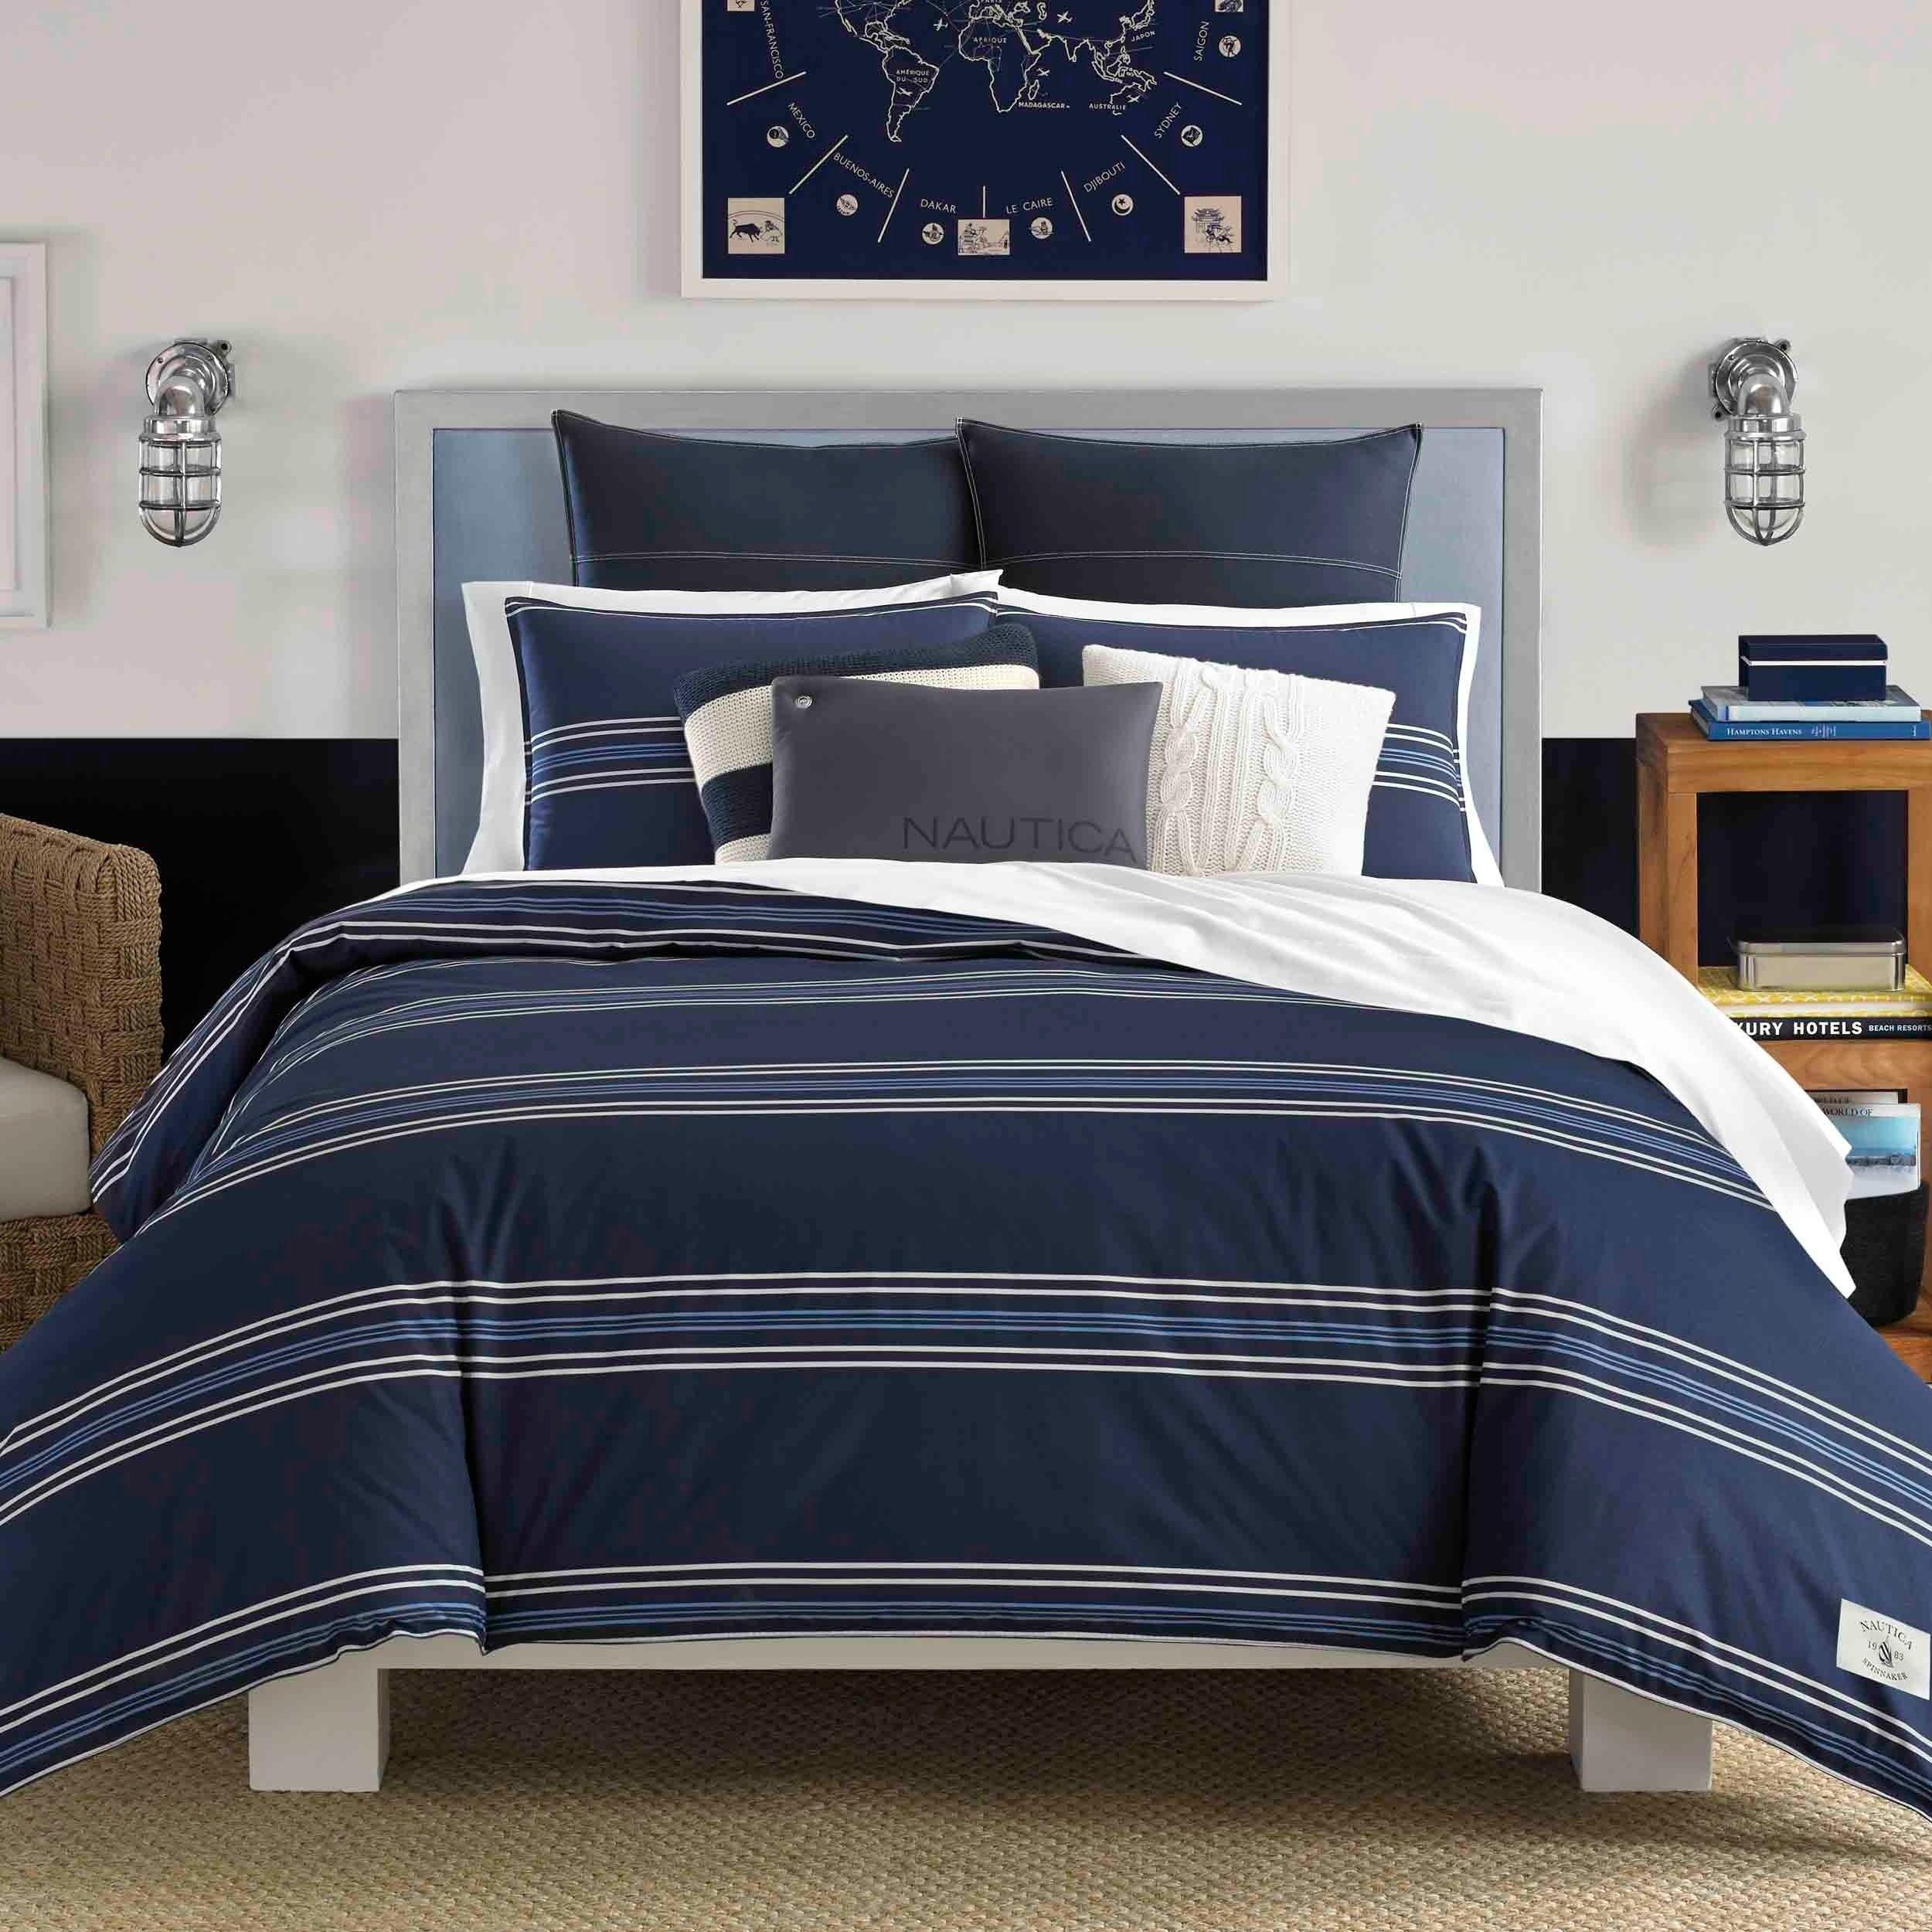 Nautica Acton 3 Piece King Size Comforter Set As Is Item 3